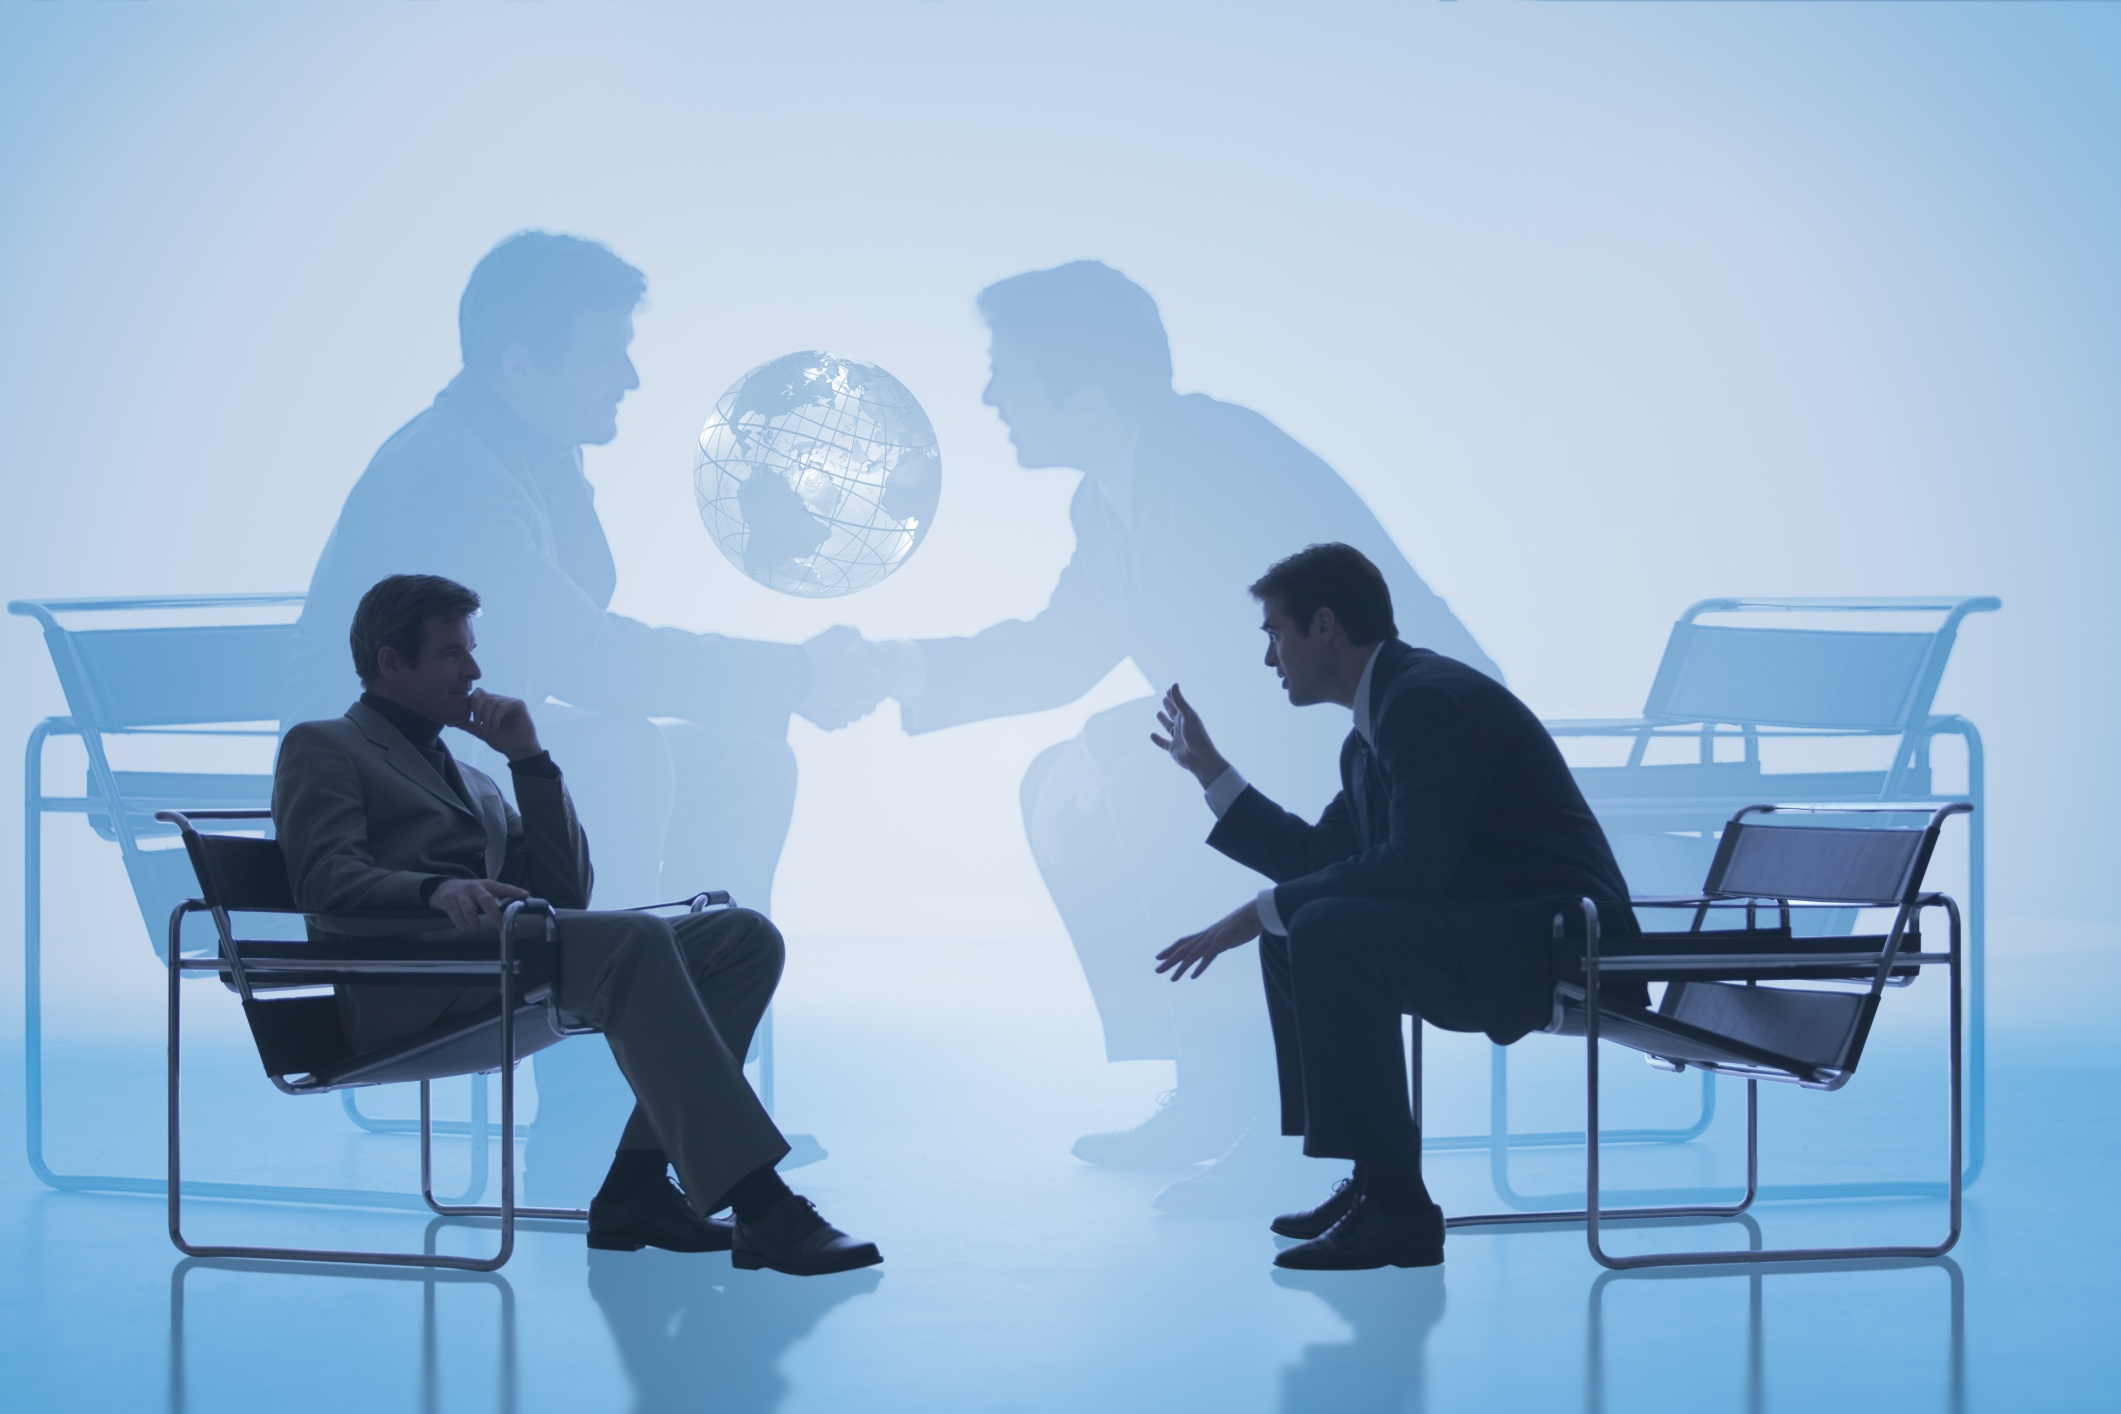 Two_men_negotiating.jpg